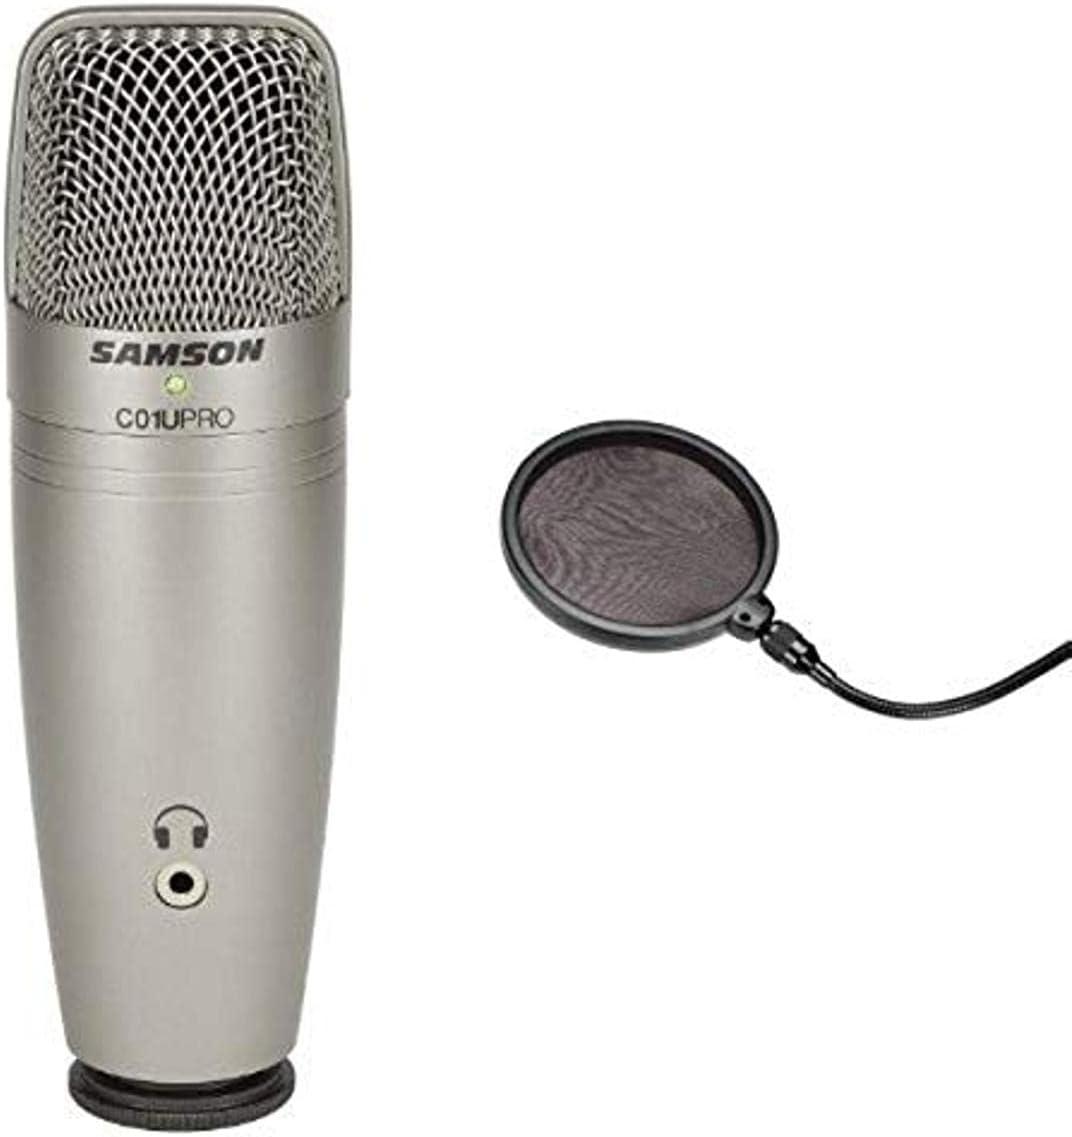 Samson Limited time sale C01UPRO USB-Mikrofon + PS 01 professioneller low-pricing F Pop